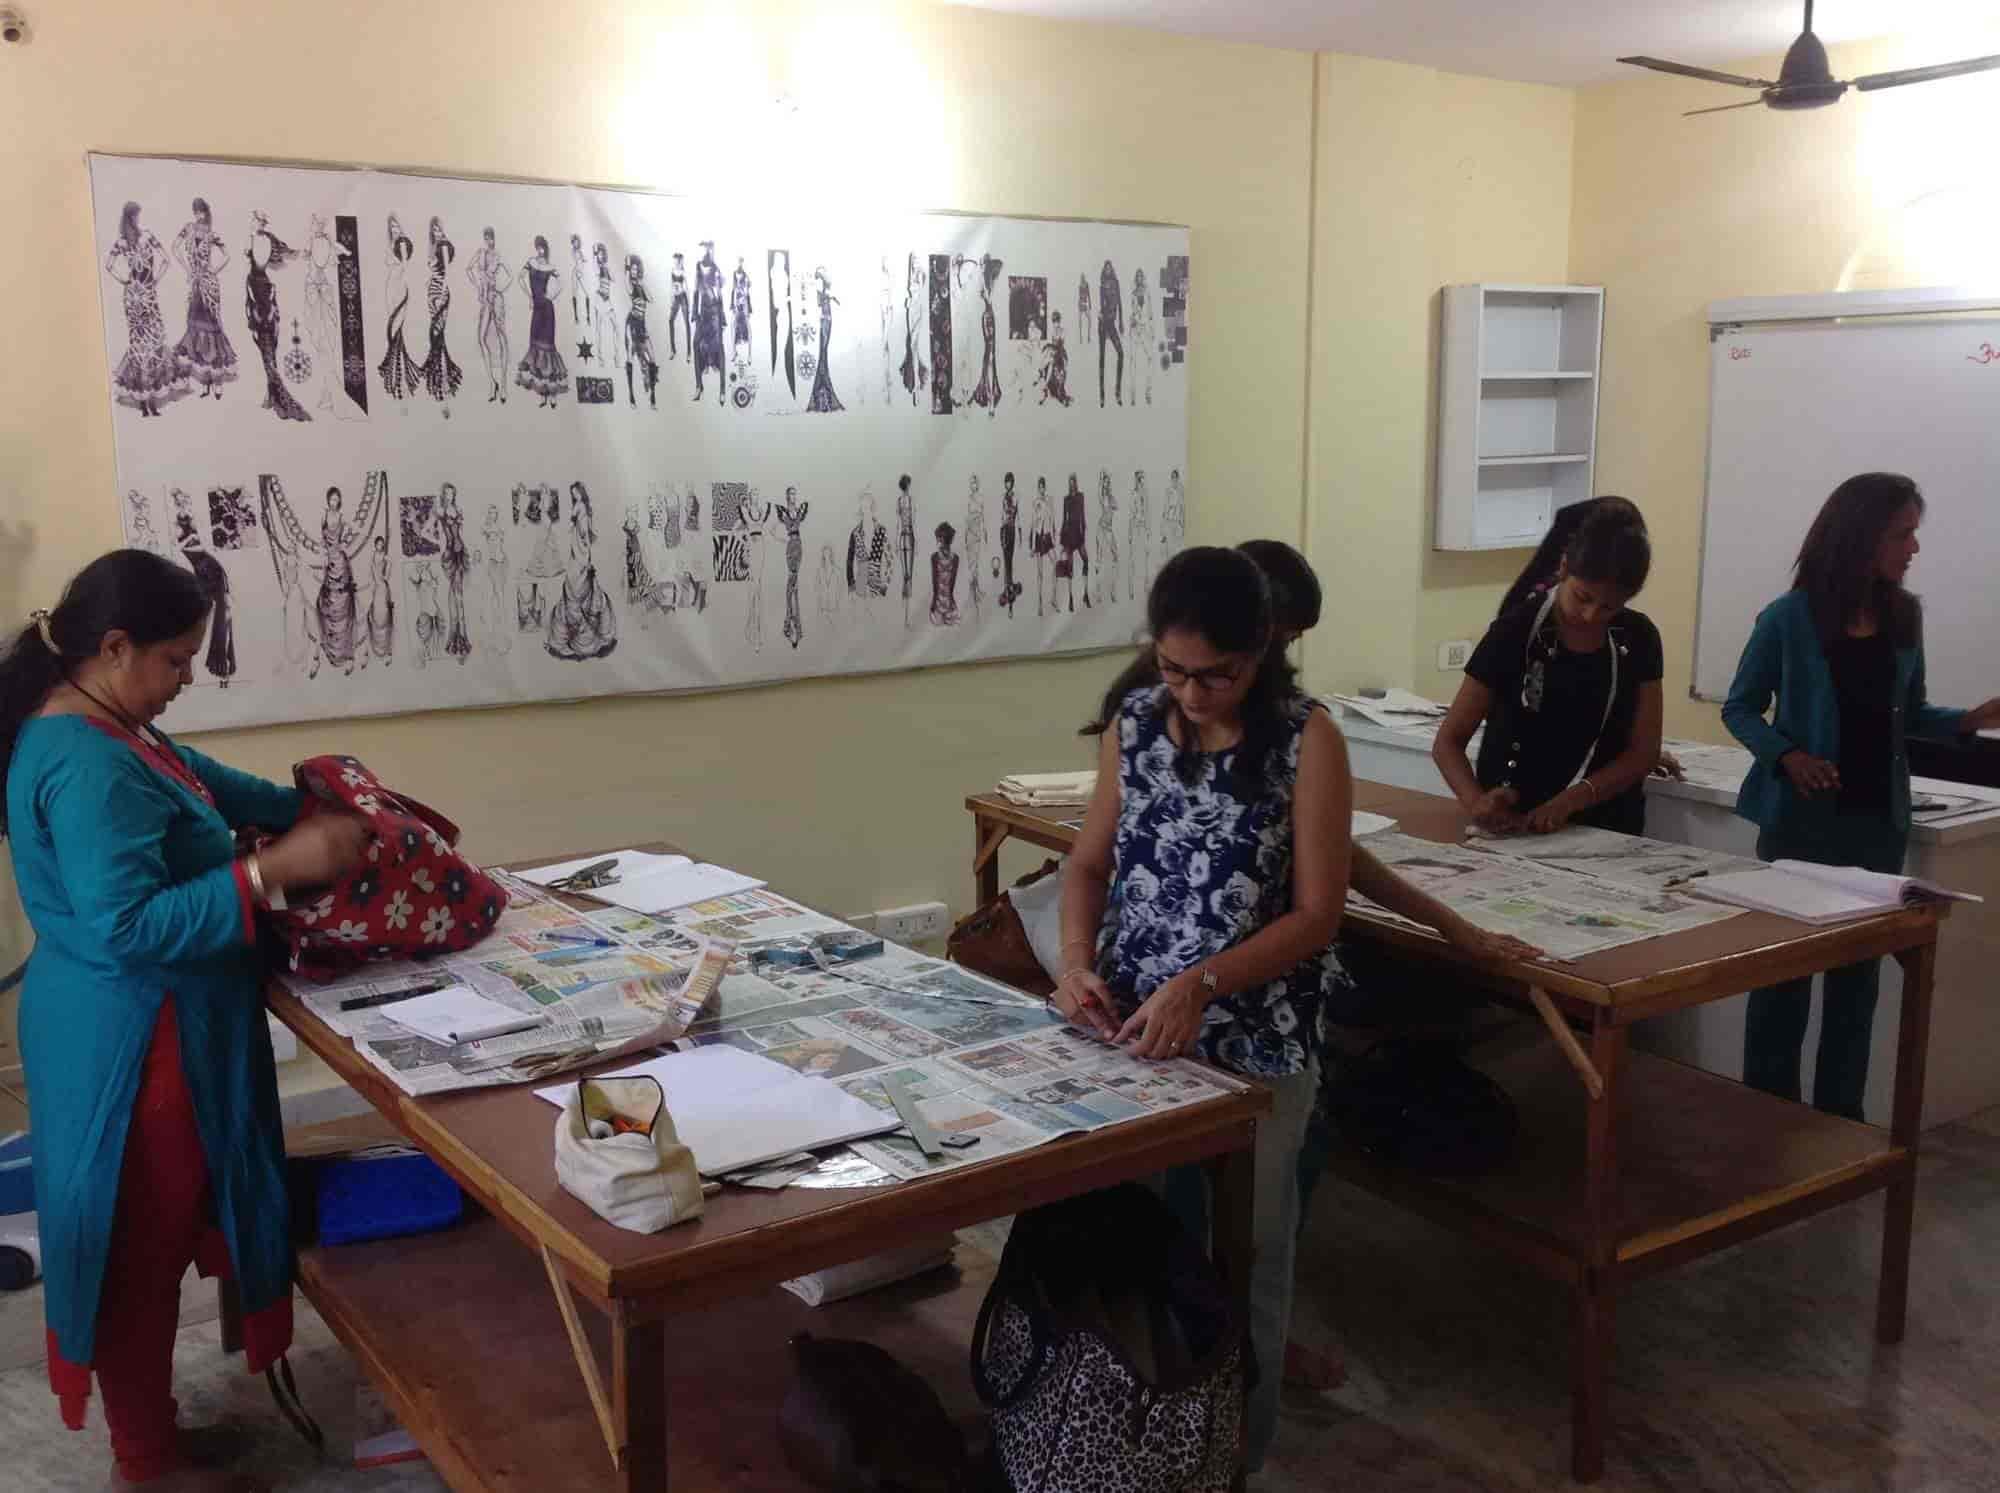 Dj S Institute Of Beautry And Fashion Kharghar Tailoring Classes In Navi Mumbai Mumbai Justdial